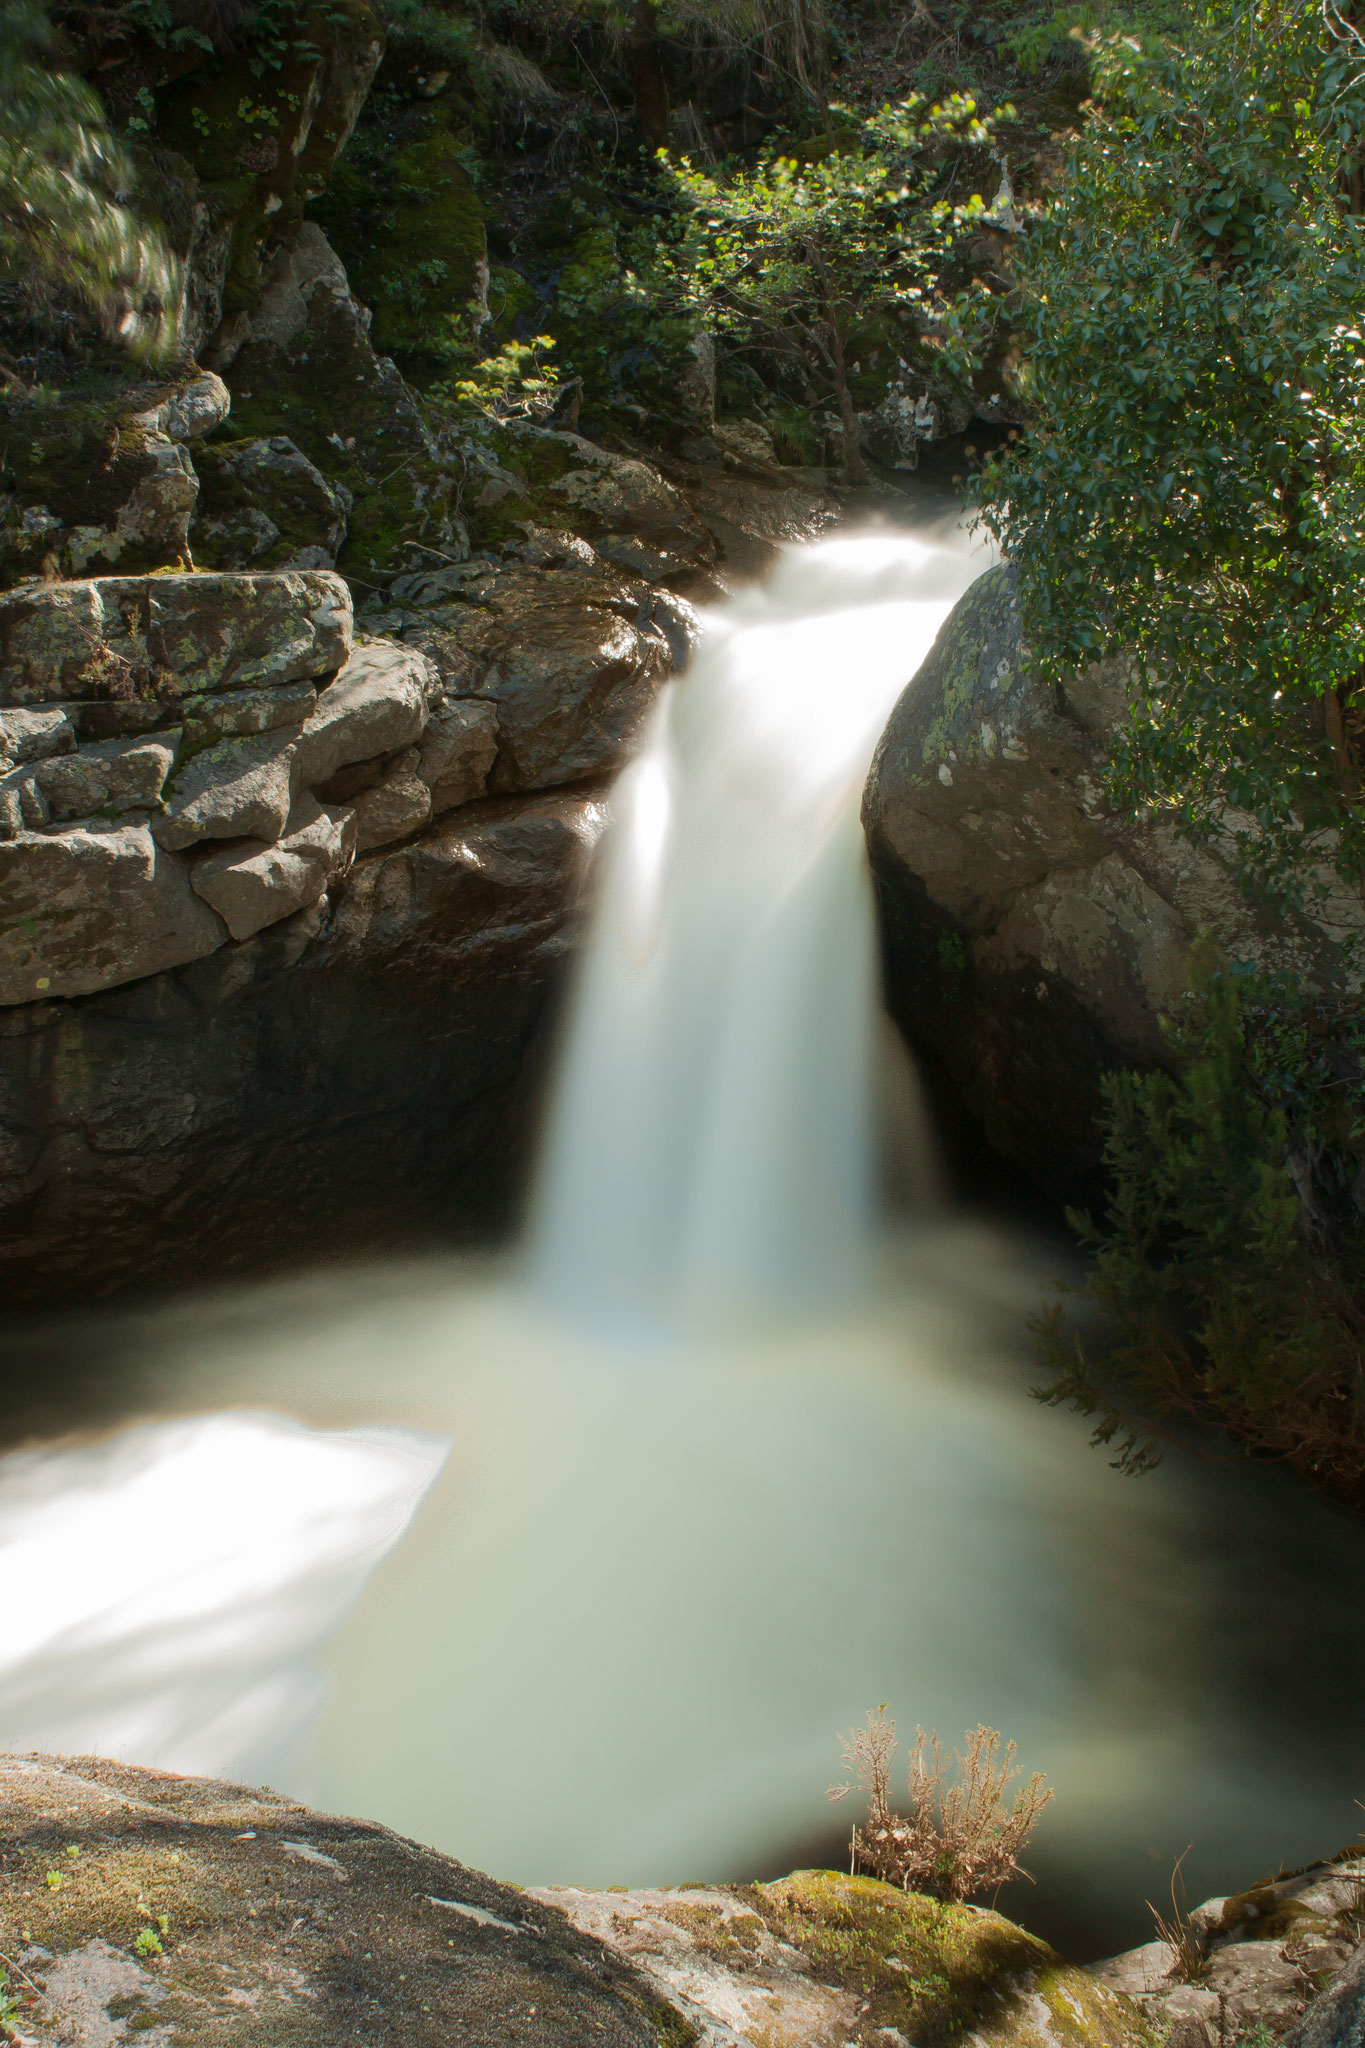 Cascada de la Ruta de las Nogaledas. Cáceres